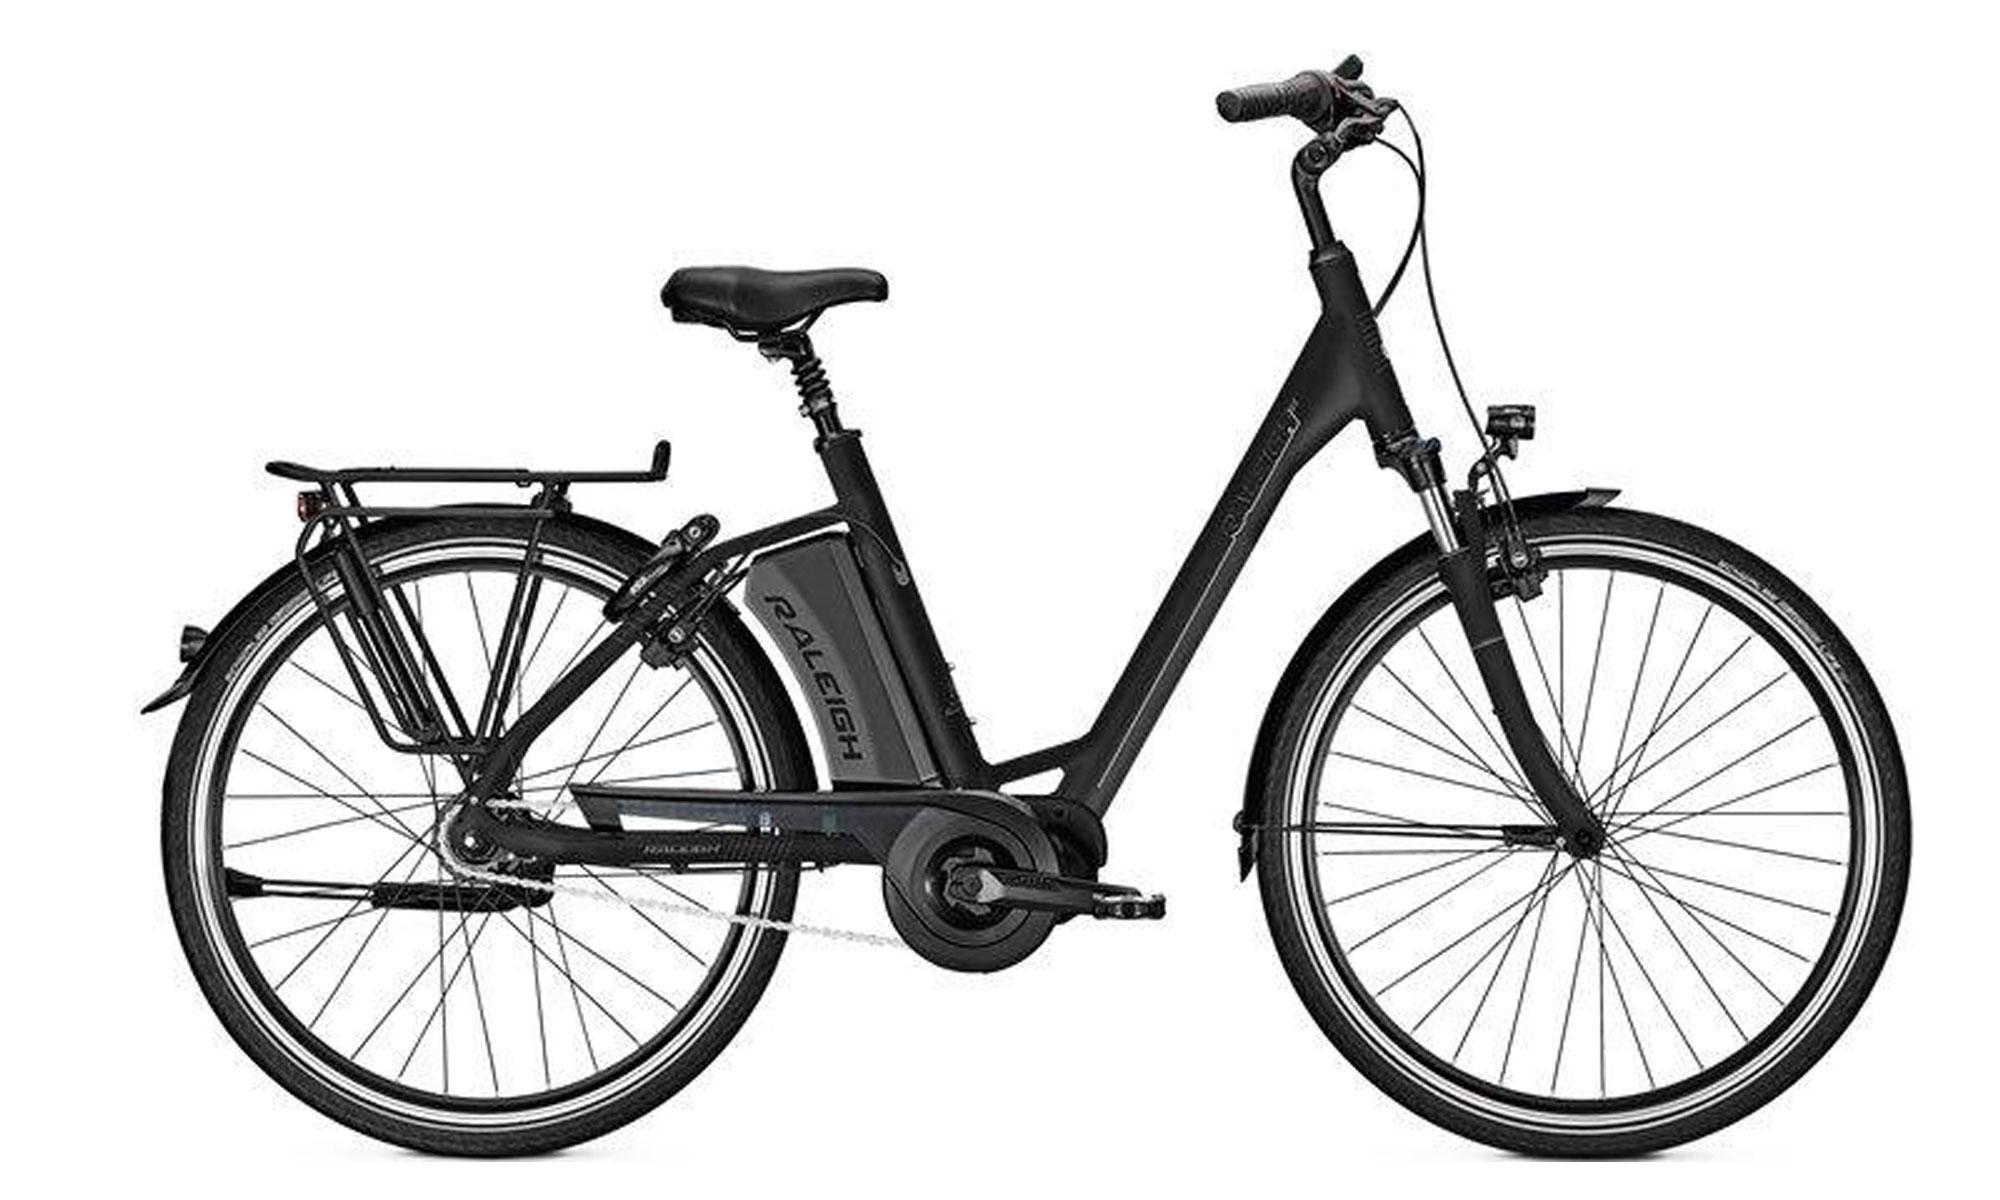 ebike dresden leistung erleben im exklusiven fahrradgesch ft f rs elektrofahrrad fahrrad. Black Bedroom Furniture Sets. Home Design Ideas